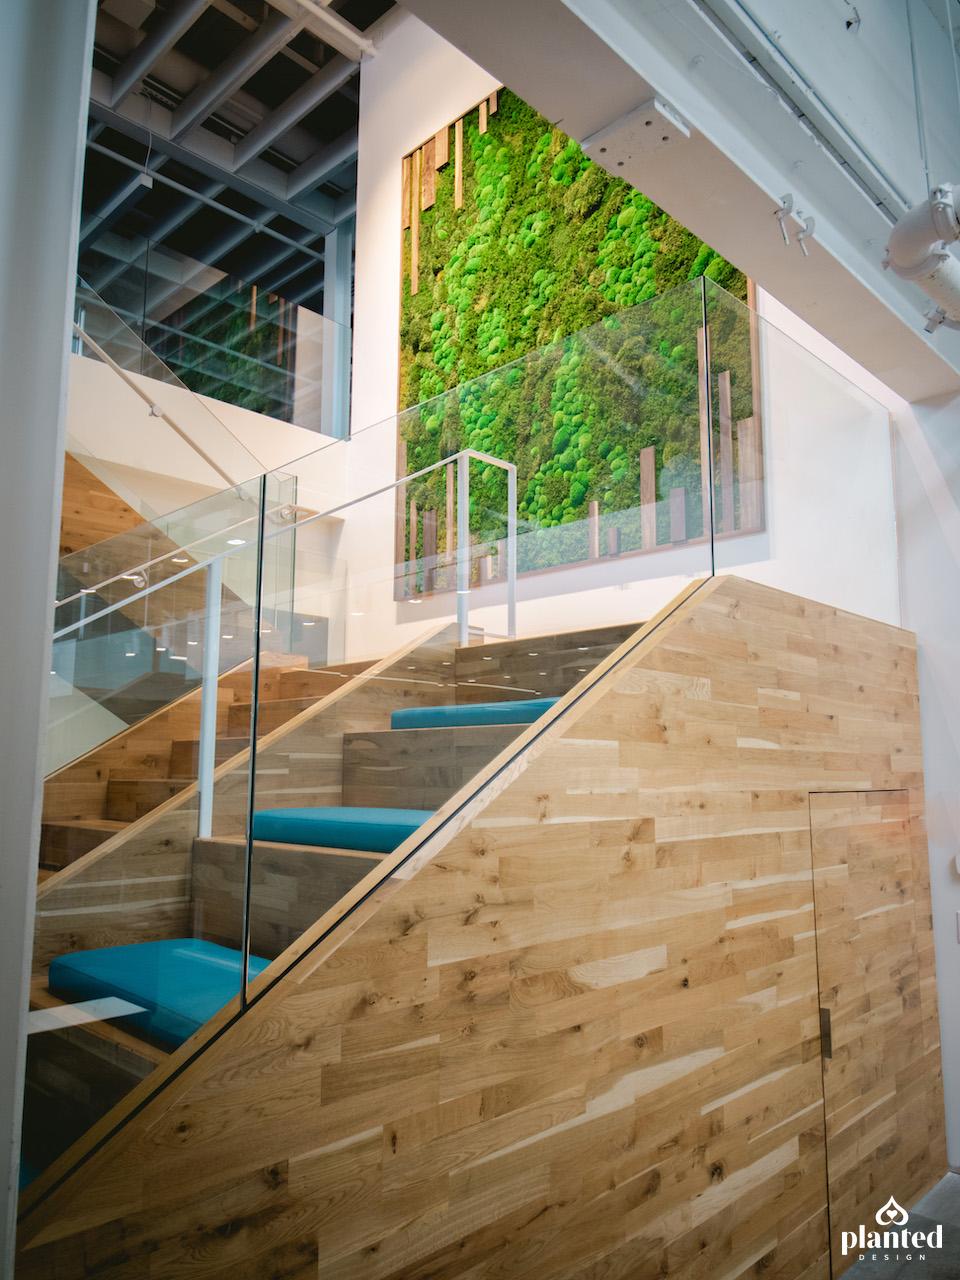 PlantedDesign_MossWall_PerfectDayFoods_Emeryville_California_Office-11_fixed .jpg